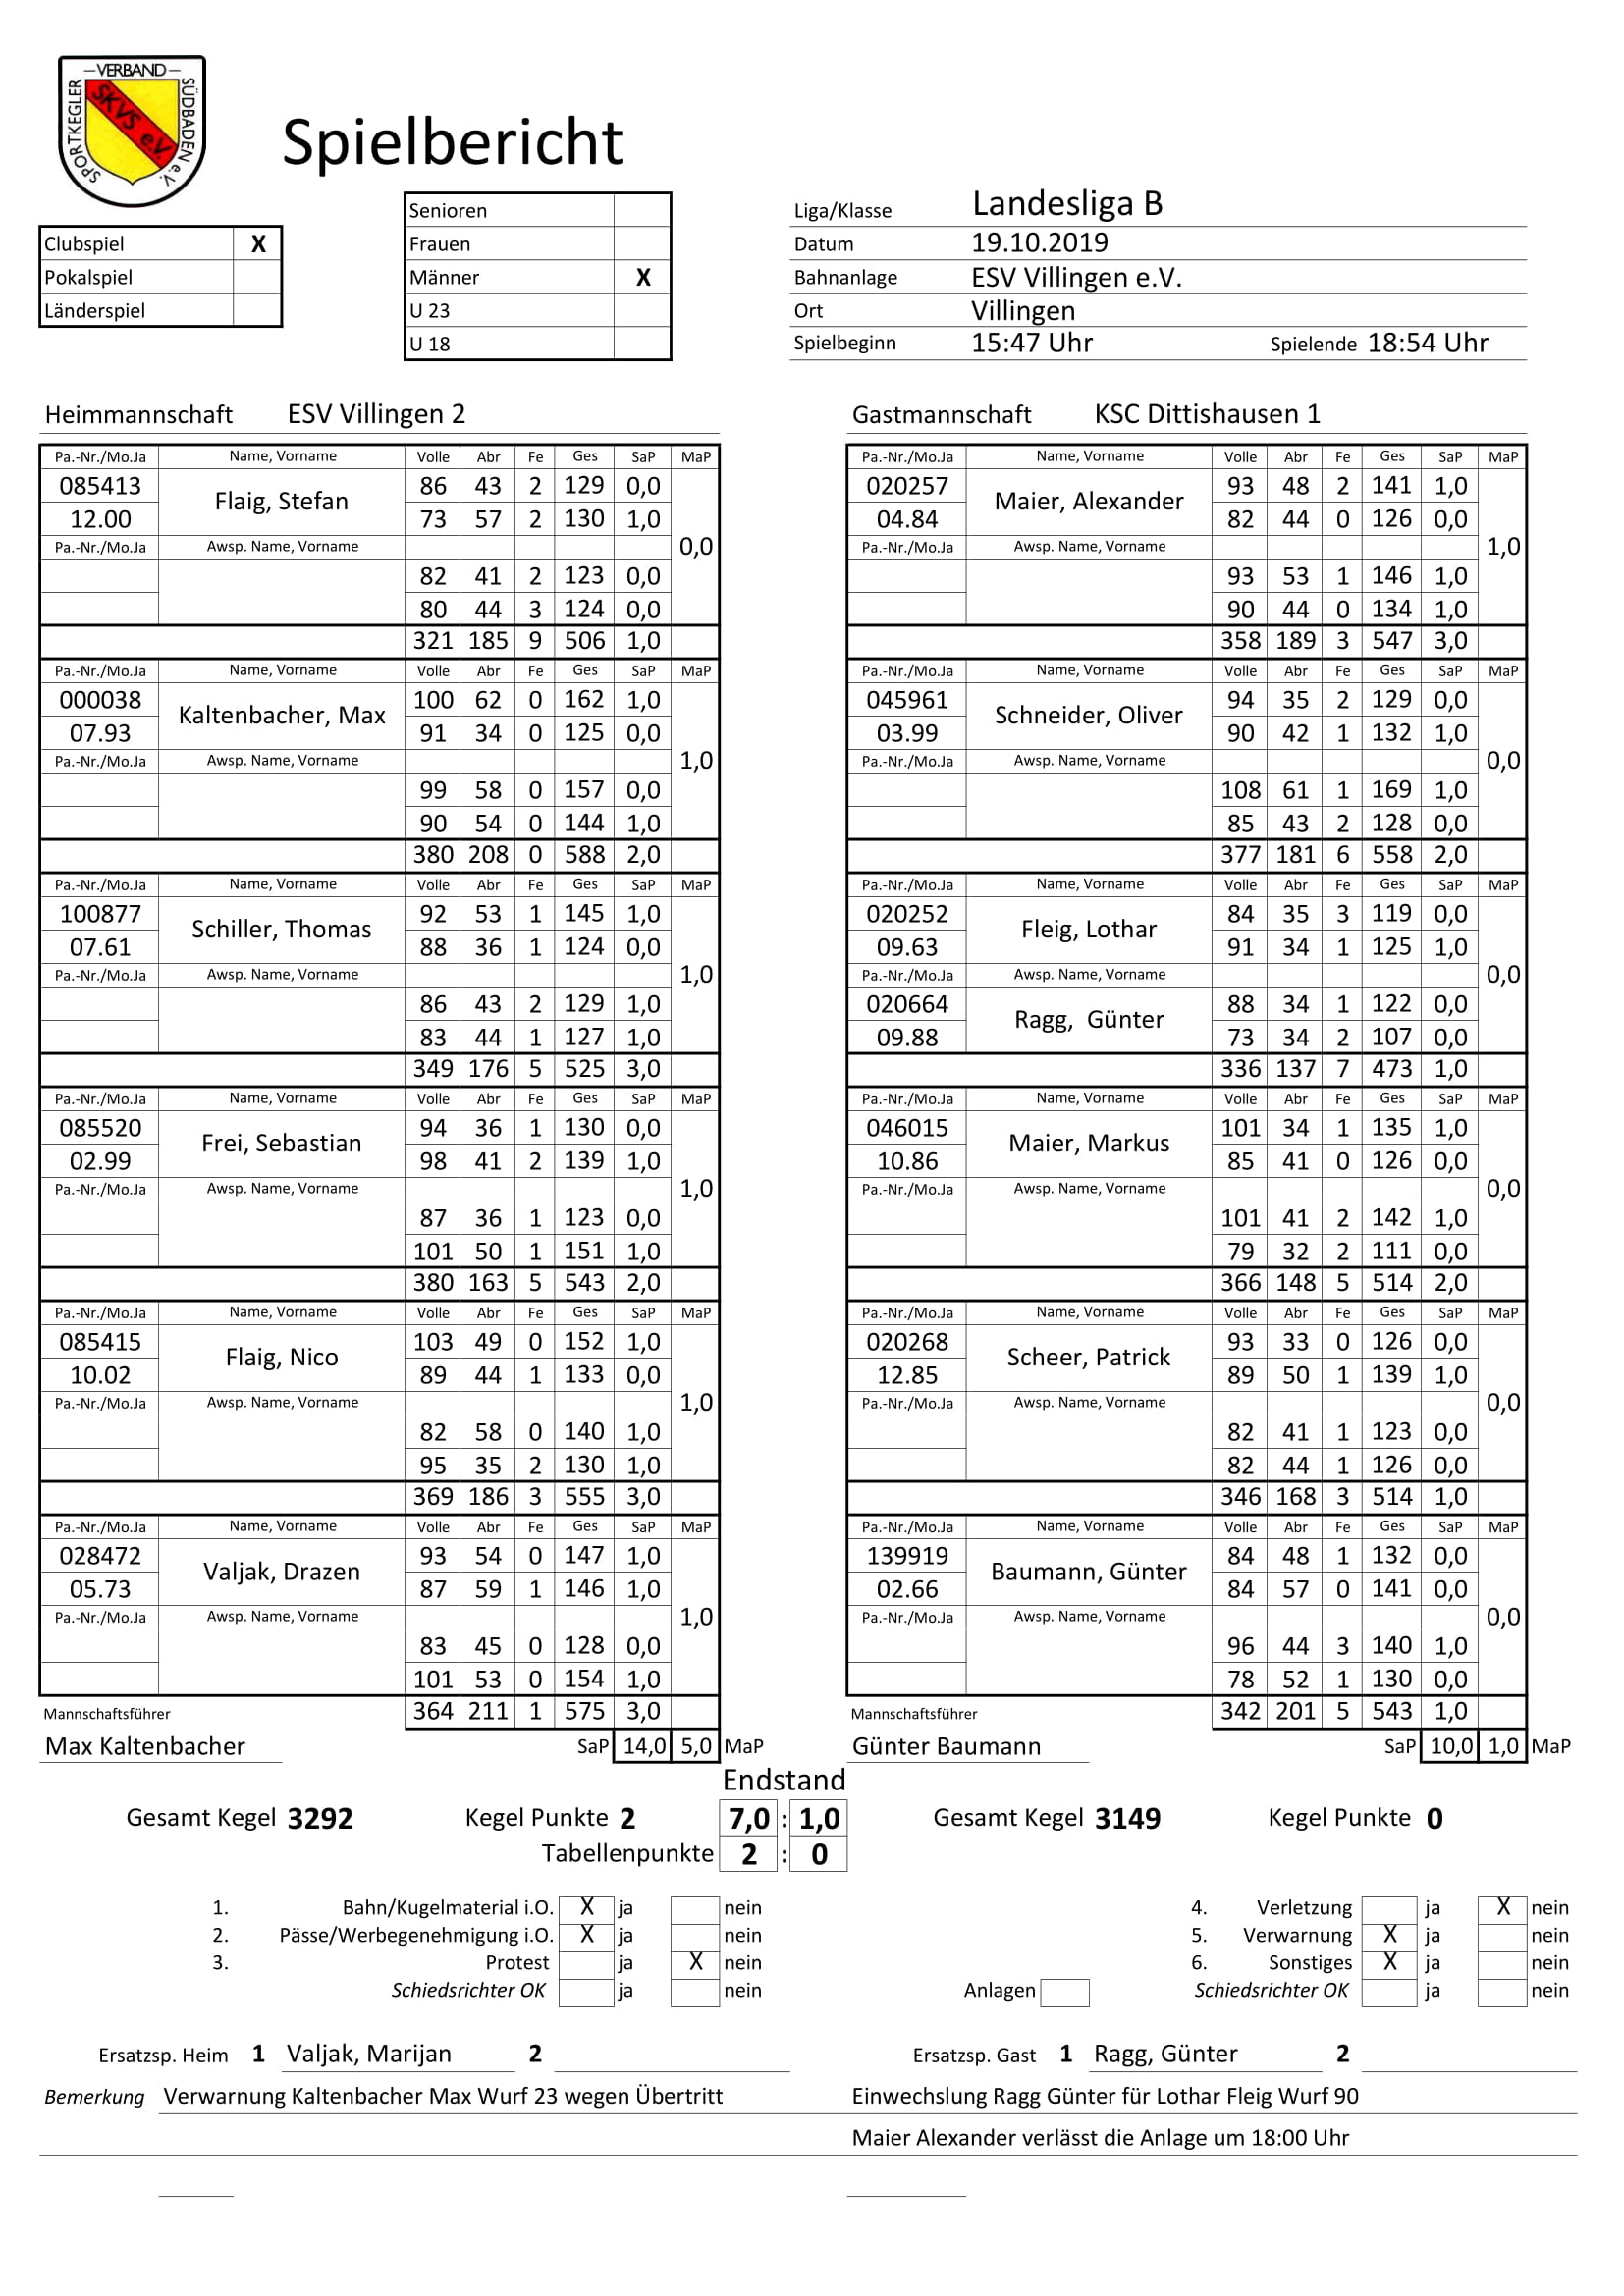 ESV Villingen 2 Gegen KSC Dittishausen 1